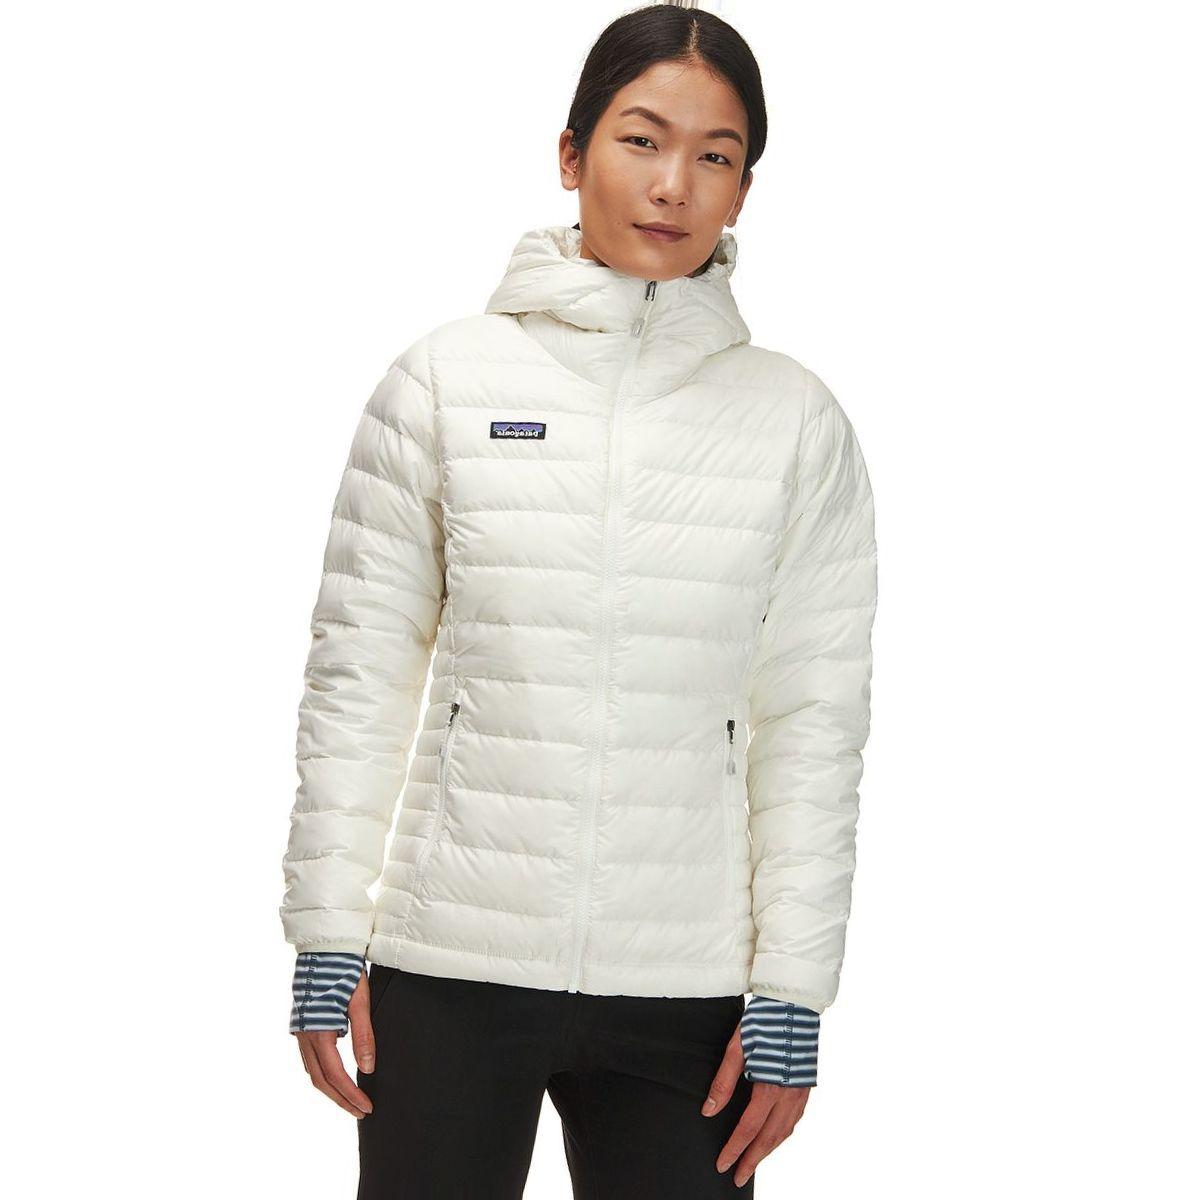 Patagonia Down Sweater Full-Zip Hooded Jacket - Women's